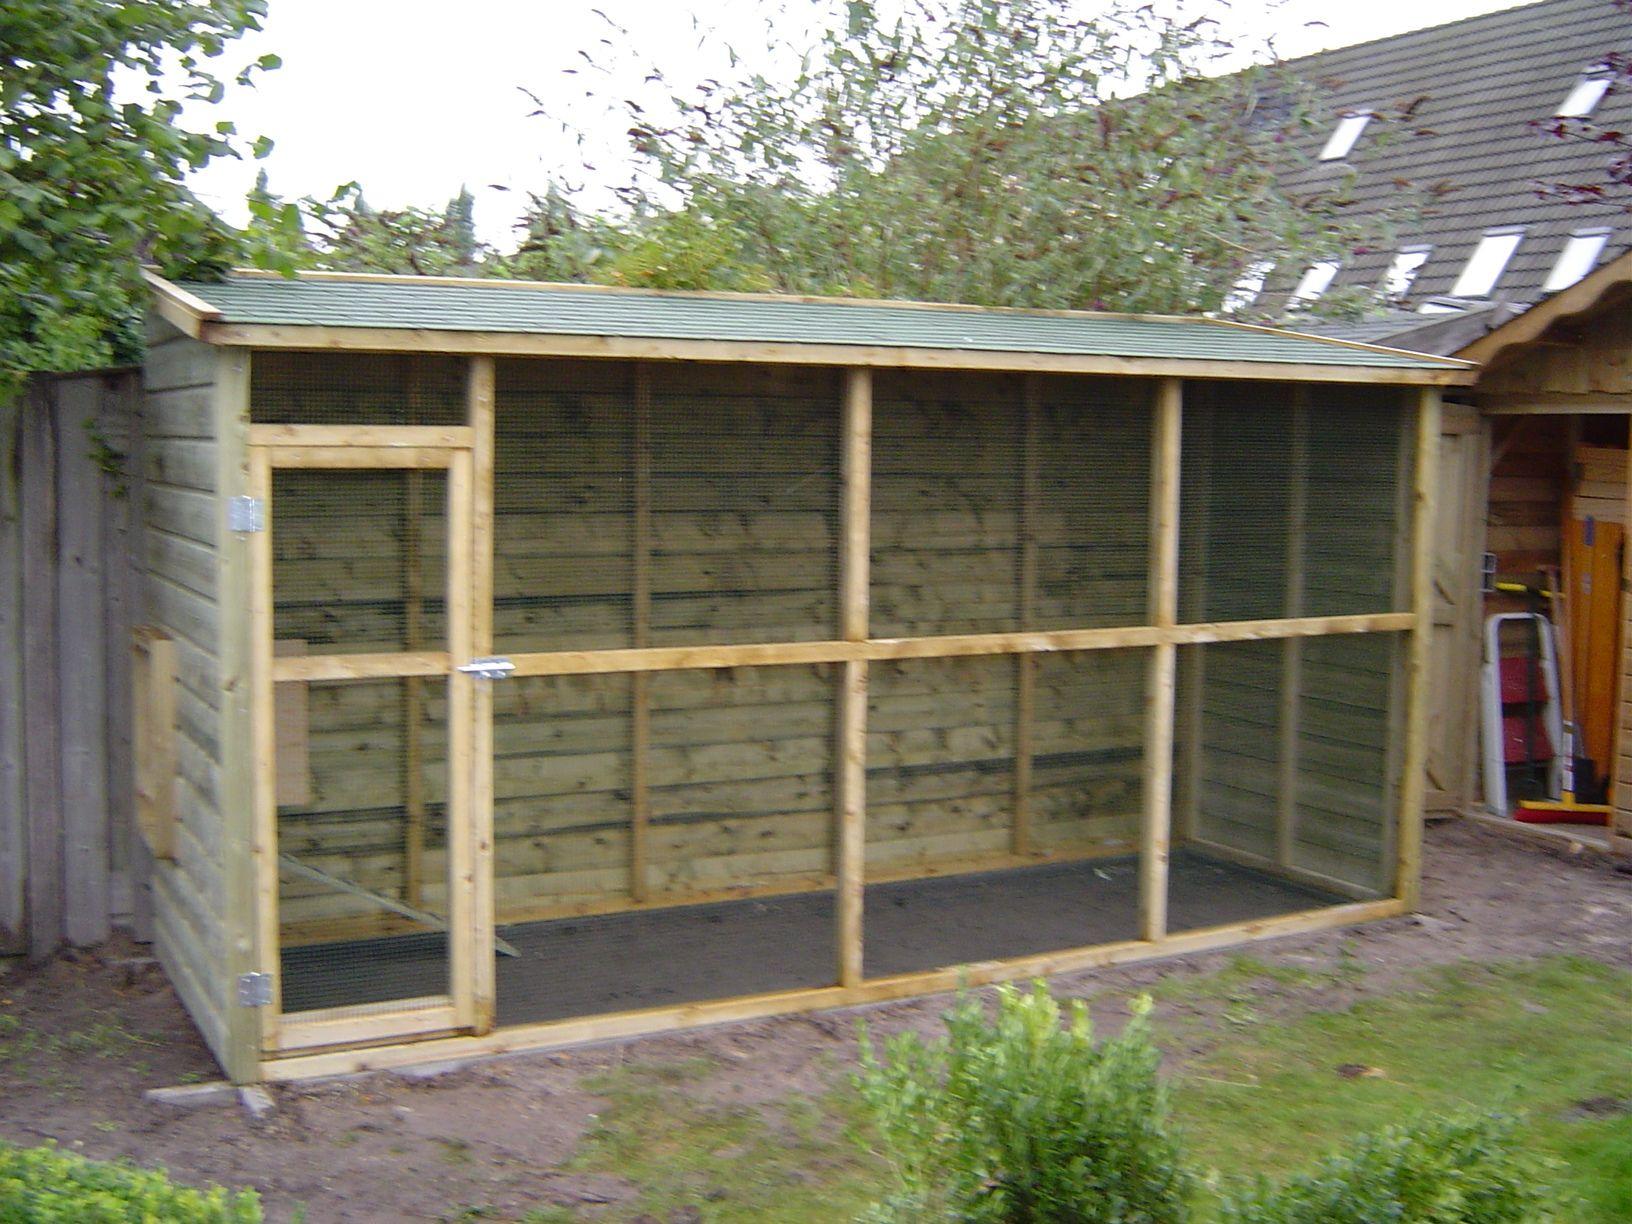 Voliere - Google Zoeken   Bird Aviary, Chickens Backyard ... tout Voliere De Jardin